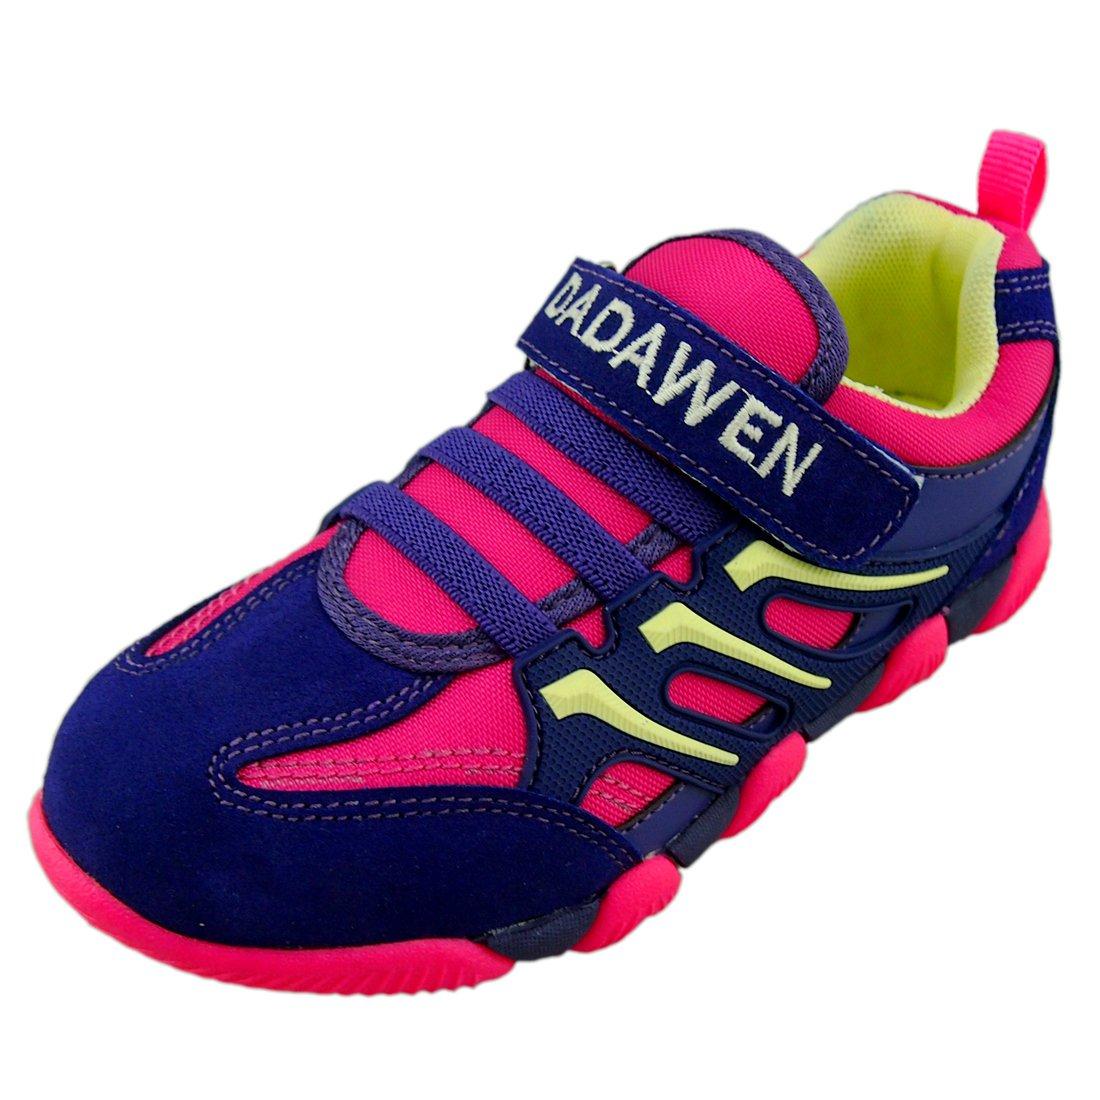 DADAWEN Mixte Enfant Sneaker Chaussure 10066